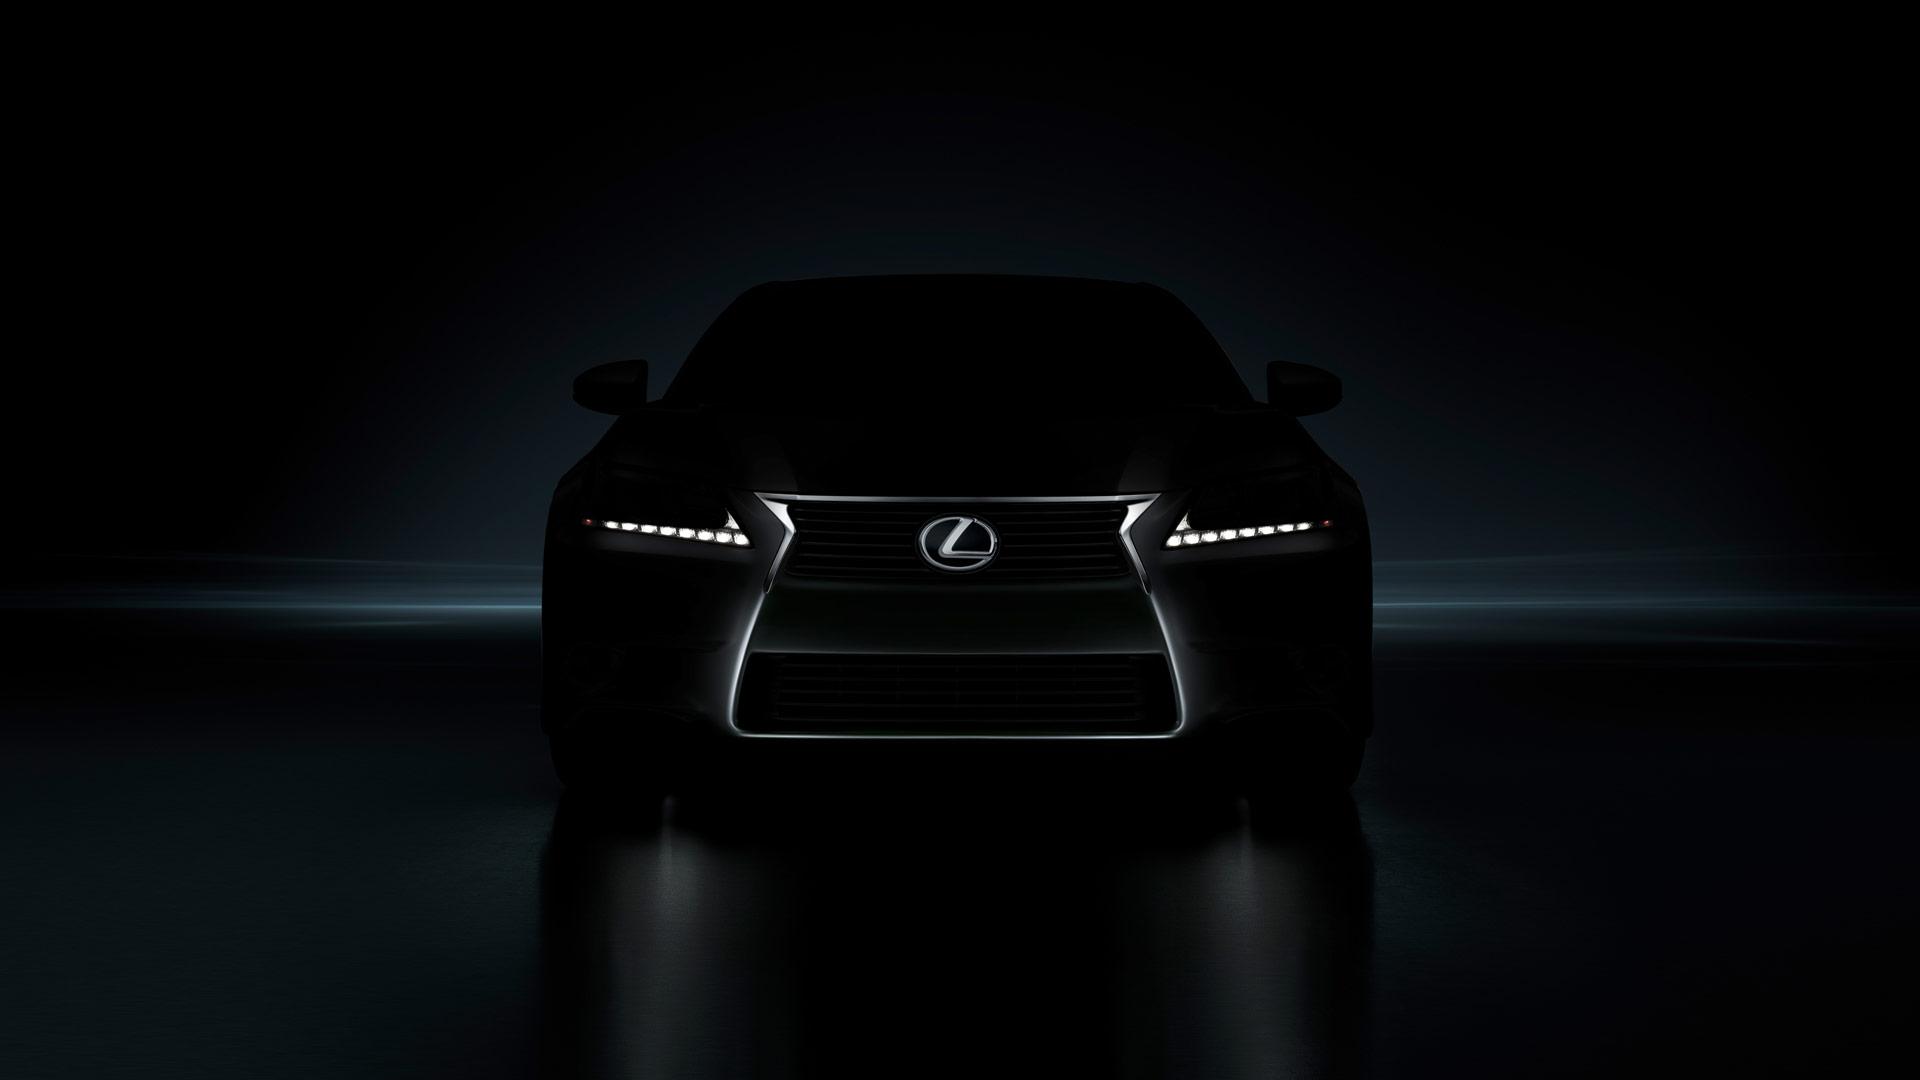 Lexus Wallpapers Desktop - WallpaperSafari